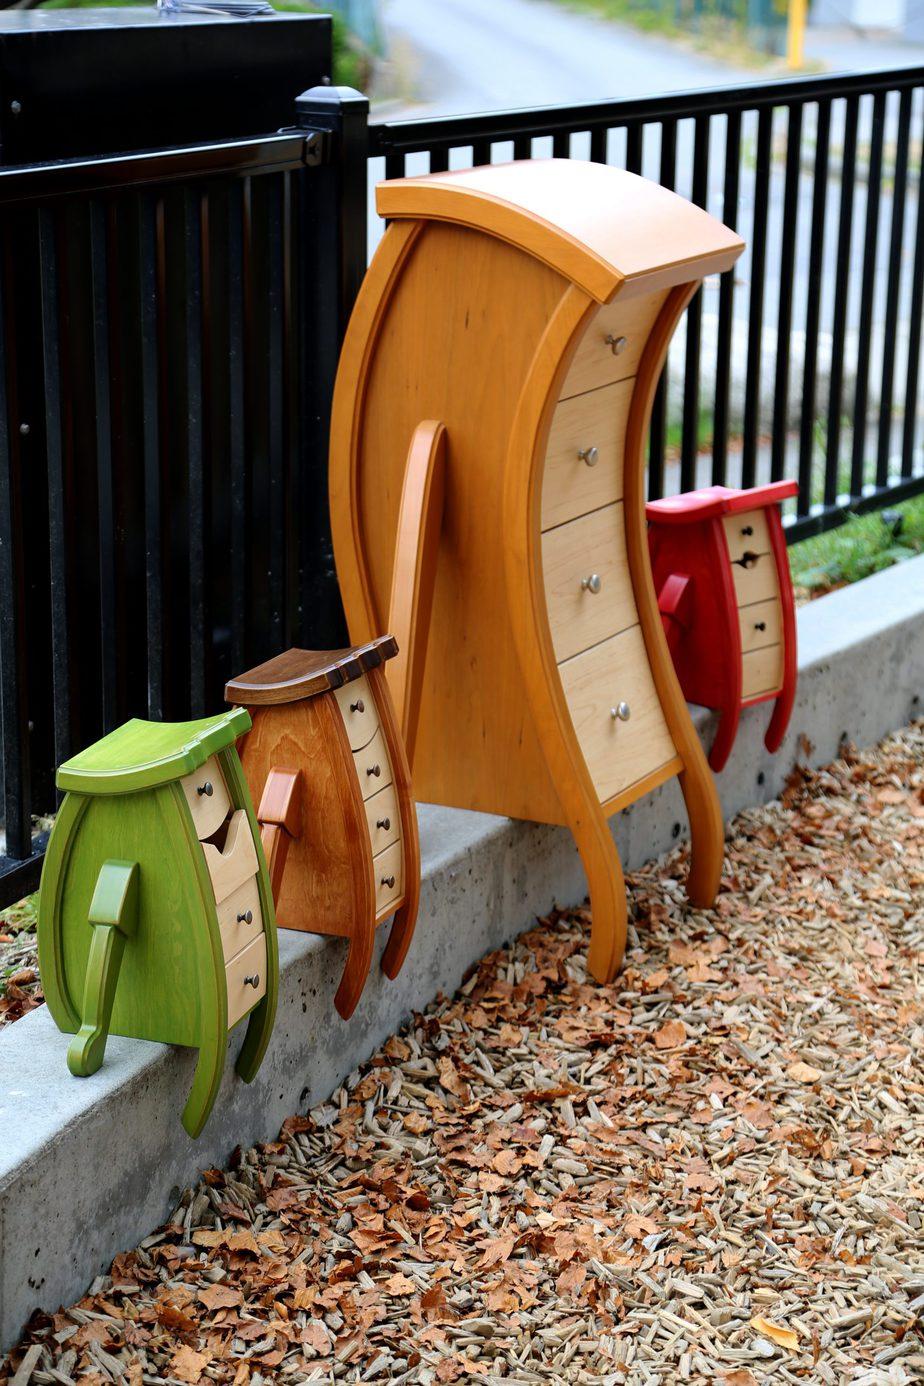 2.Unique Dresser With Minions By Simphome.com